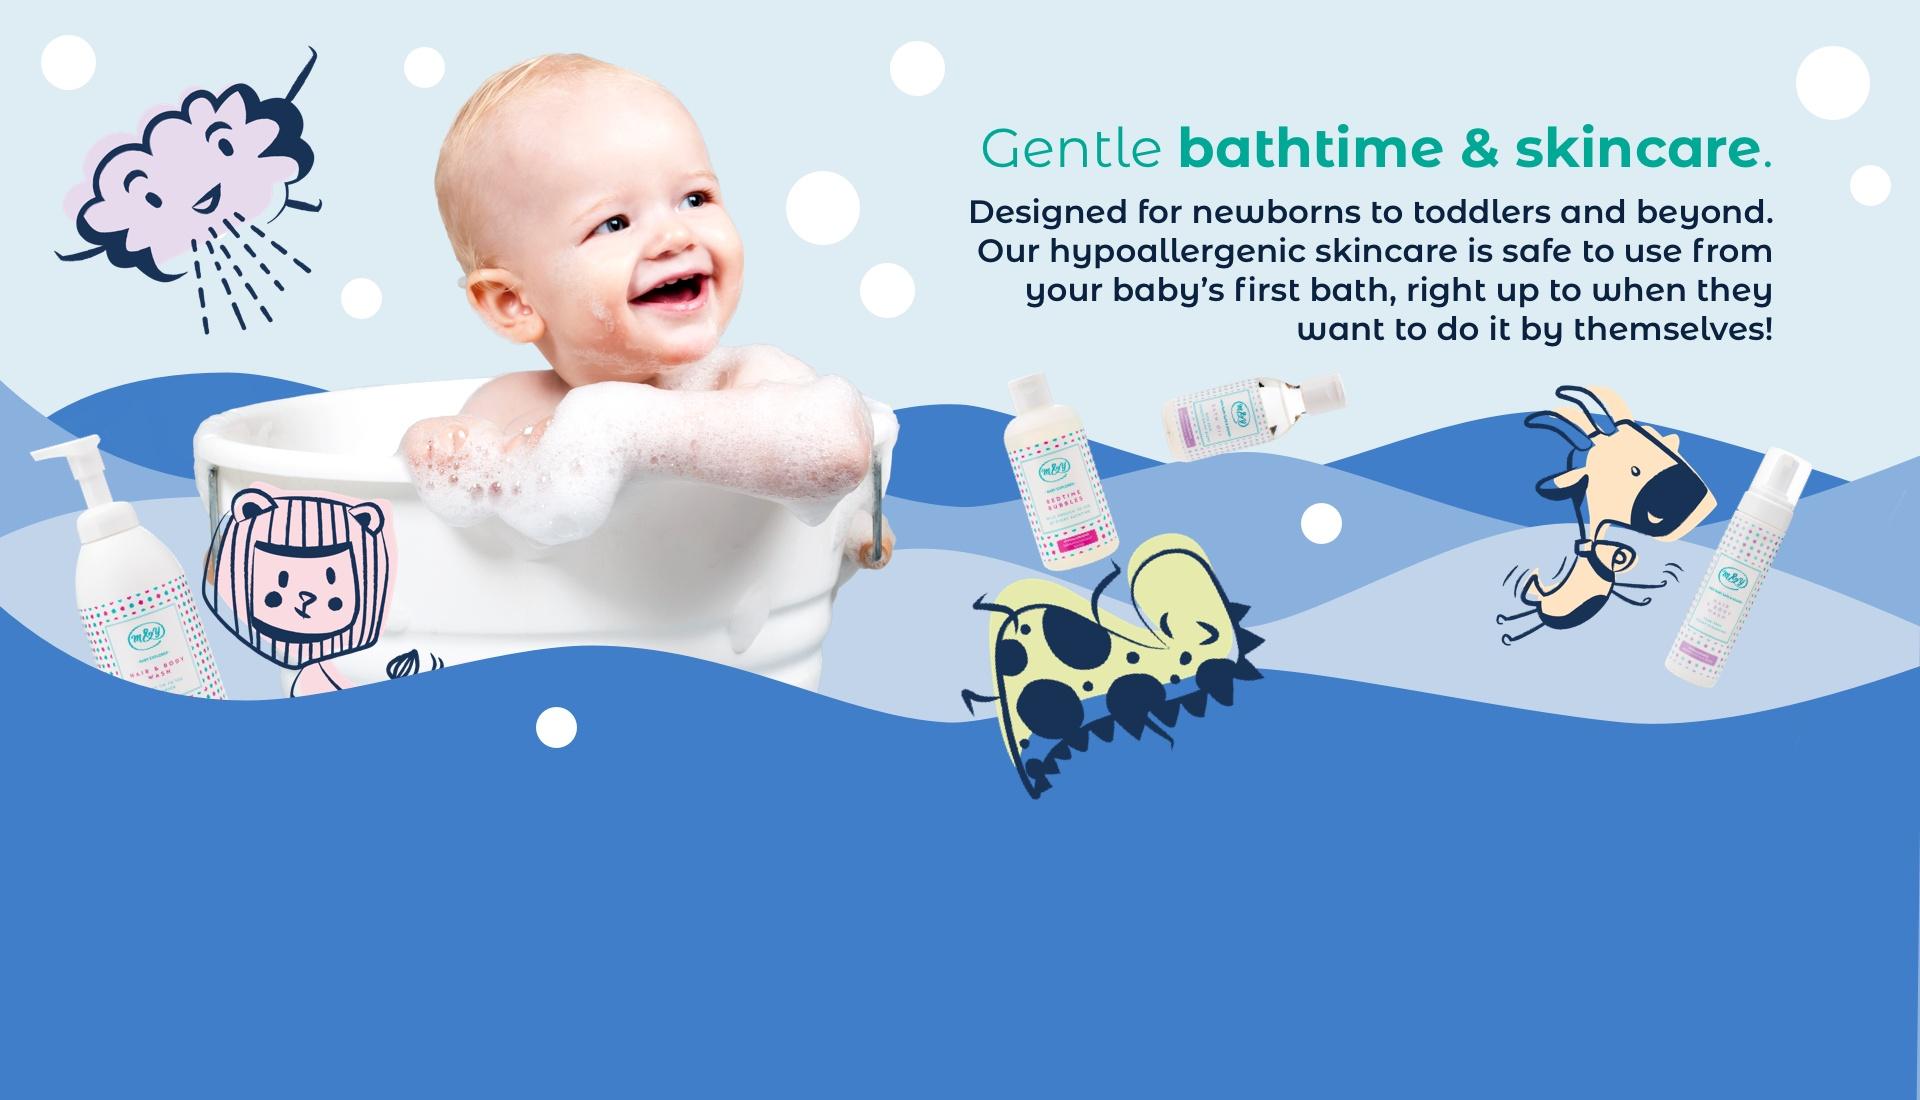 https://d2x0hkmend0gu1.cloudfront.net/pub/media/images/Bathtime-skincare-Listing-Page-Banner-mumandyou.jpg